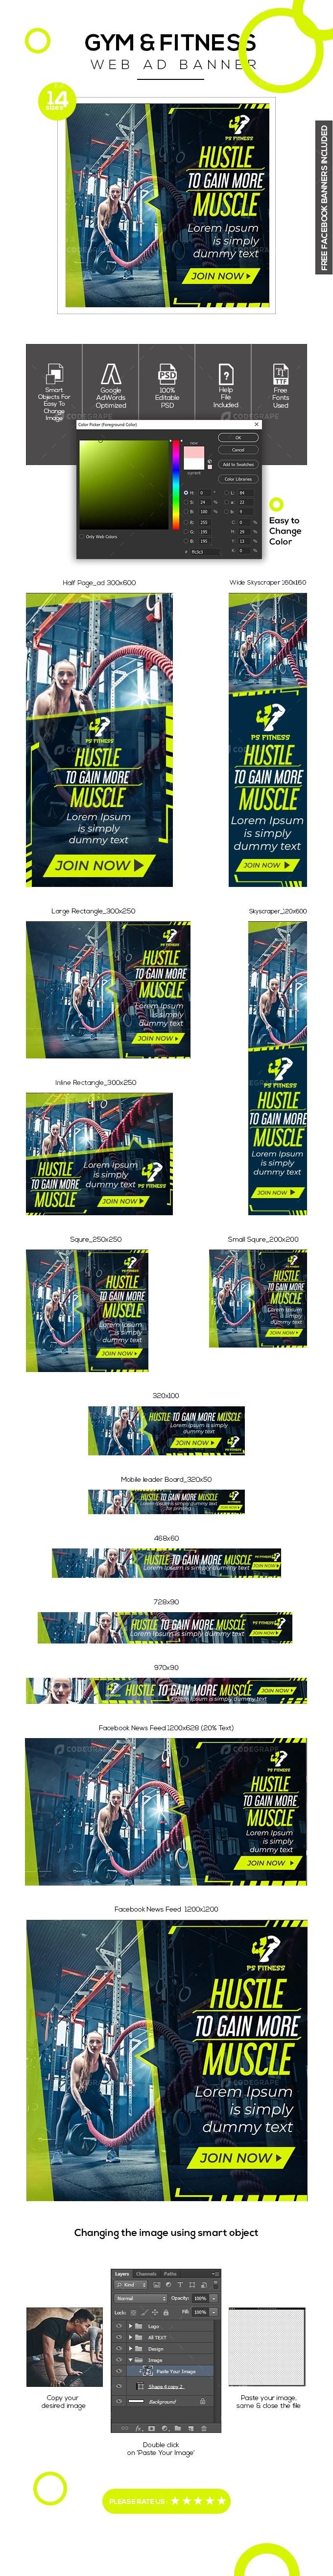 Gym/Fitness Banner Set